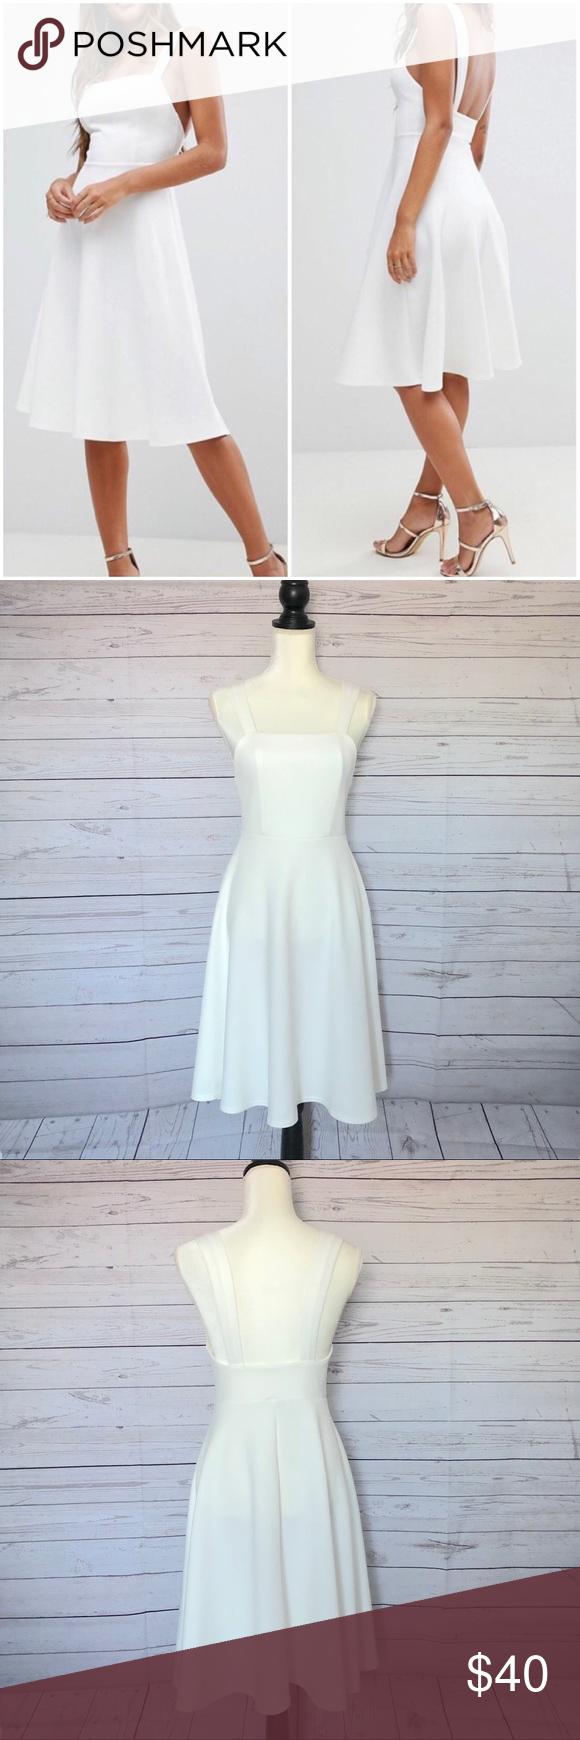 Asos White Square Neck Midi Prom Dress Dress Sz 6 Prom Dresses Dresses Square Neck [ 1740 x 580 Pixel ]